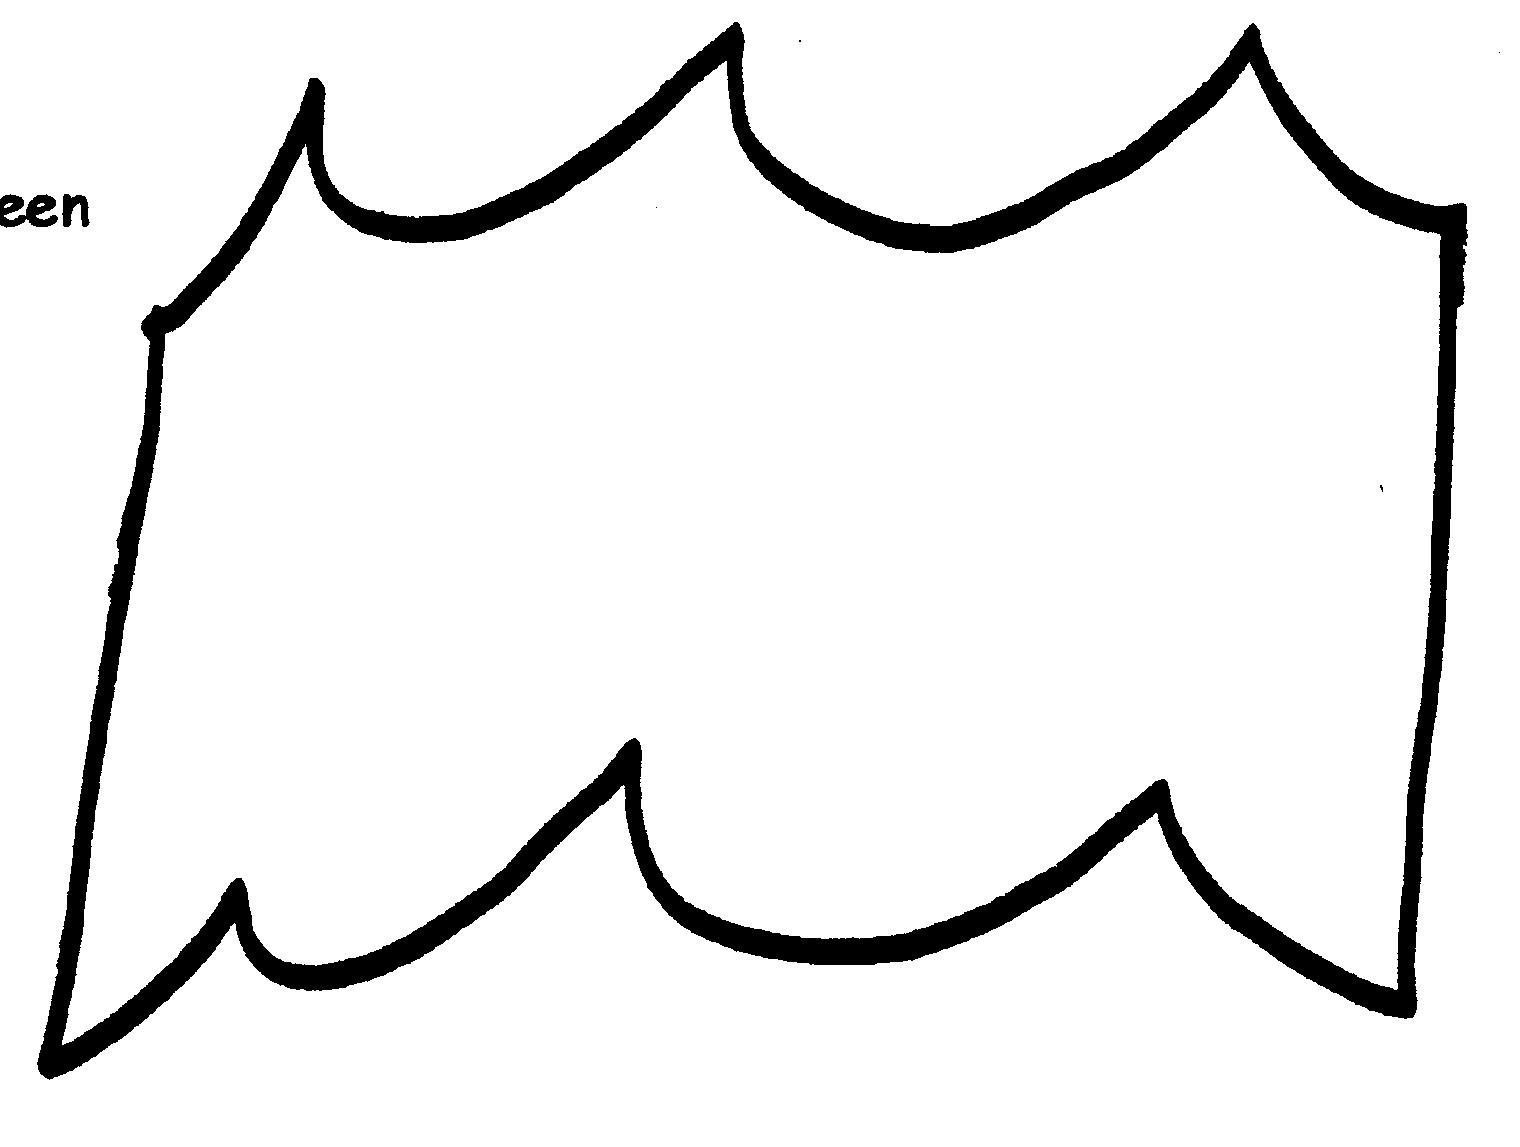 Baptist Church Symbols Clip Art Free Image